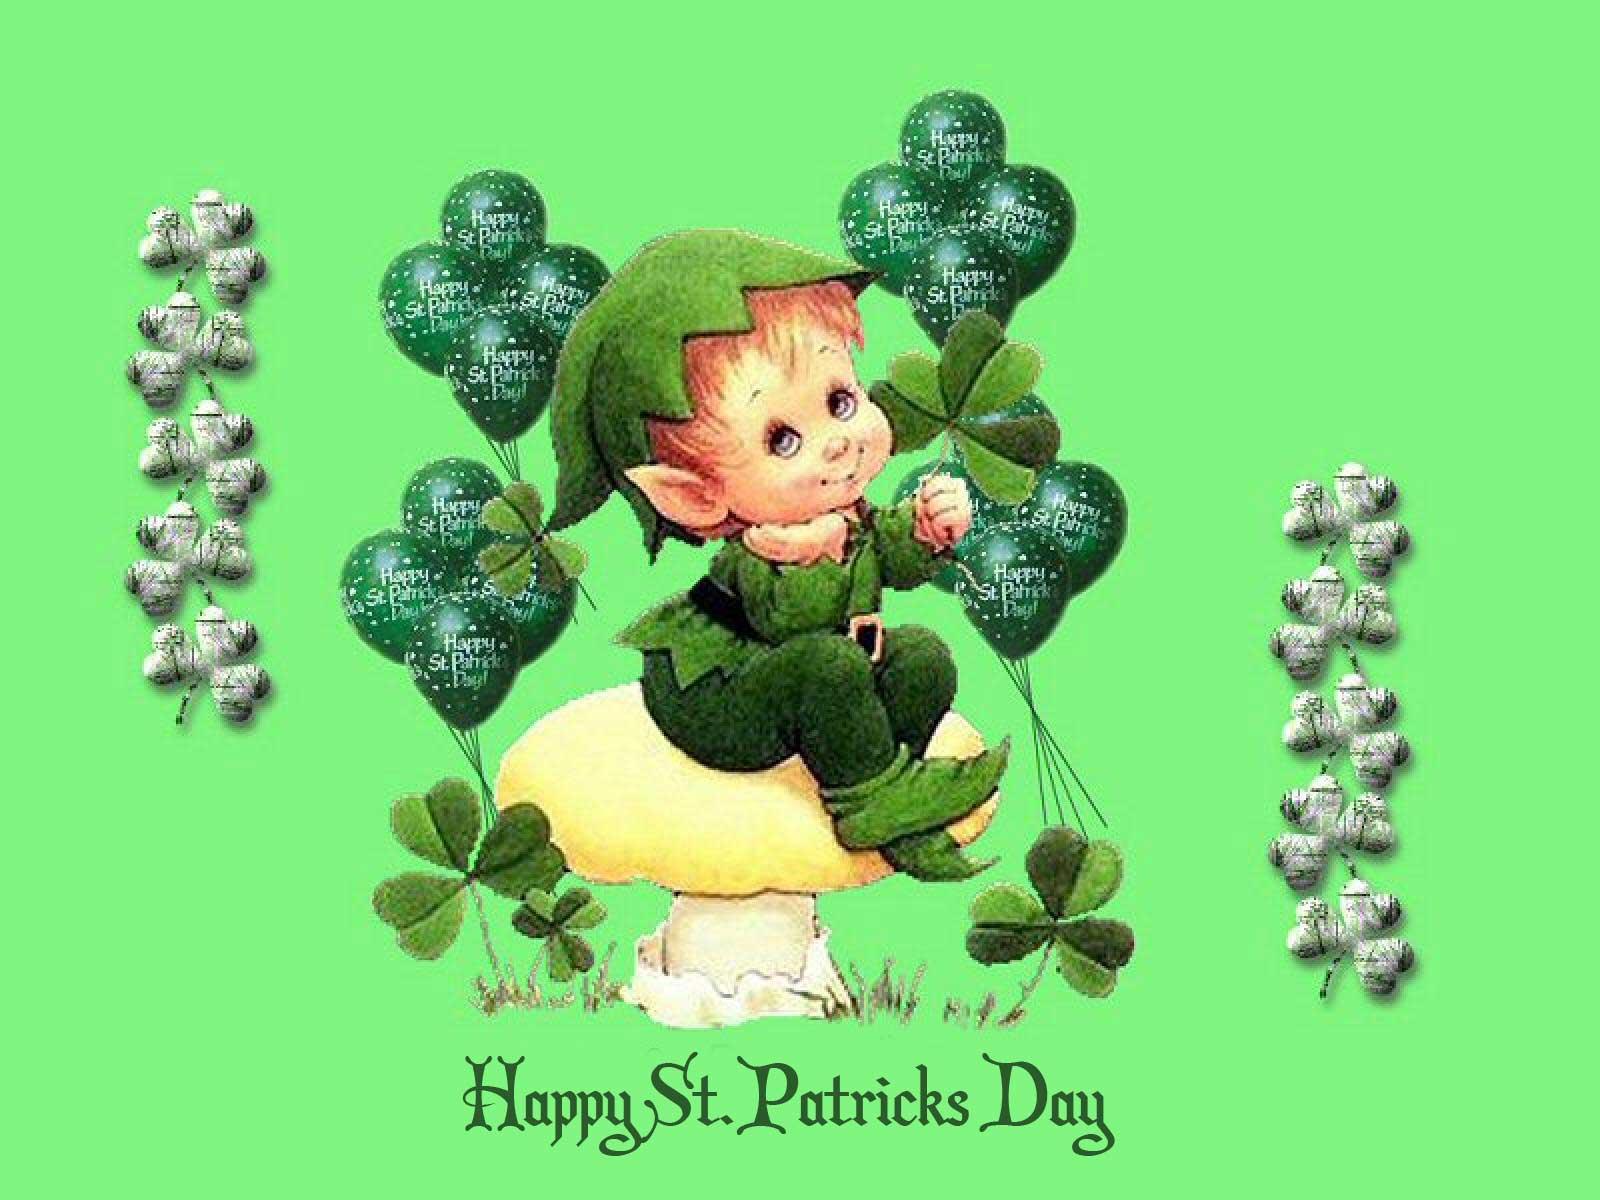 76 Free St Patricks Day Desktop Wallpaper On Wallpapersafari